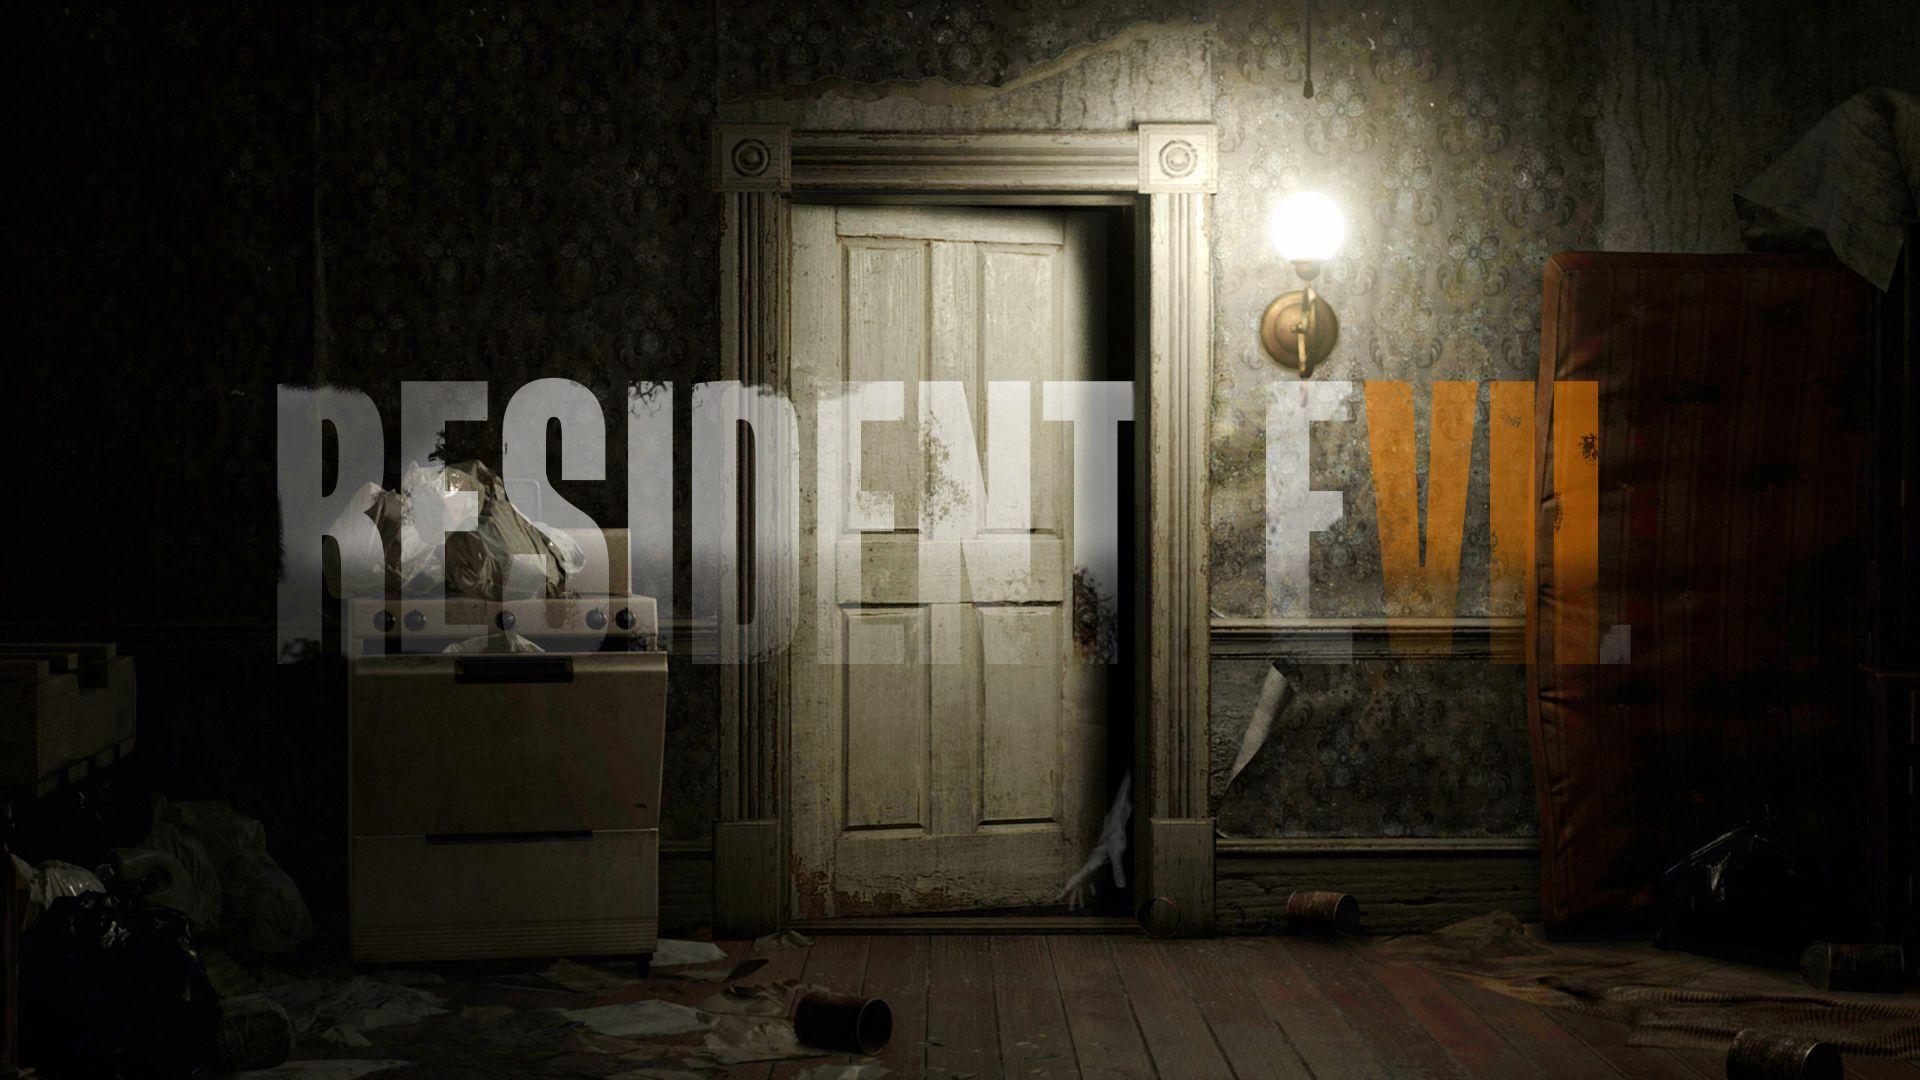 resident_evil_7_wallpaper_1080p_by_claterz-da6h49e